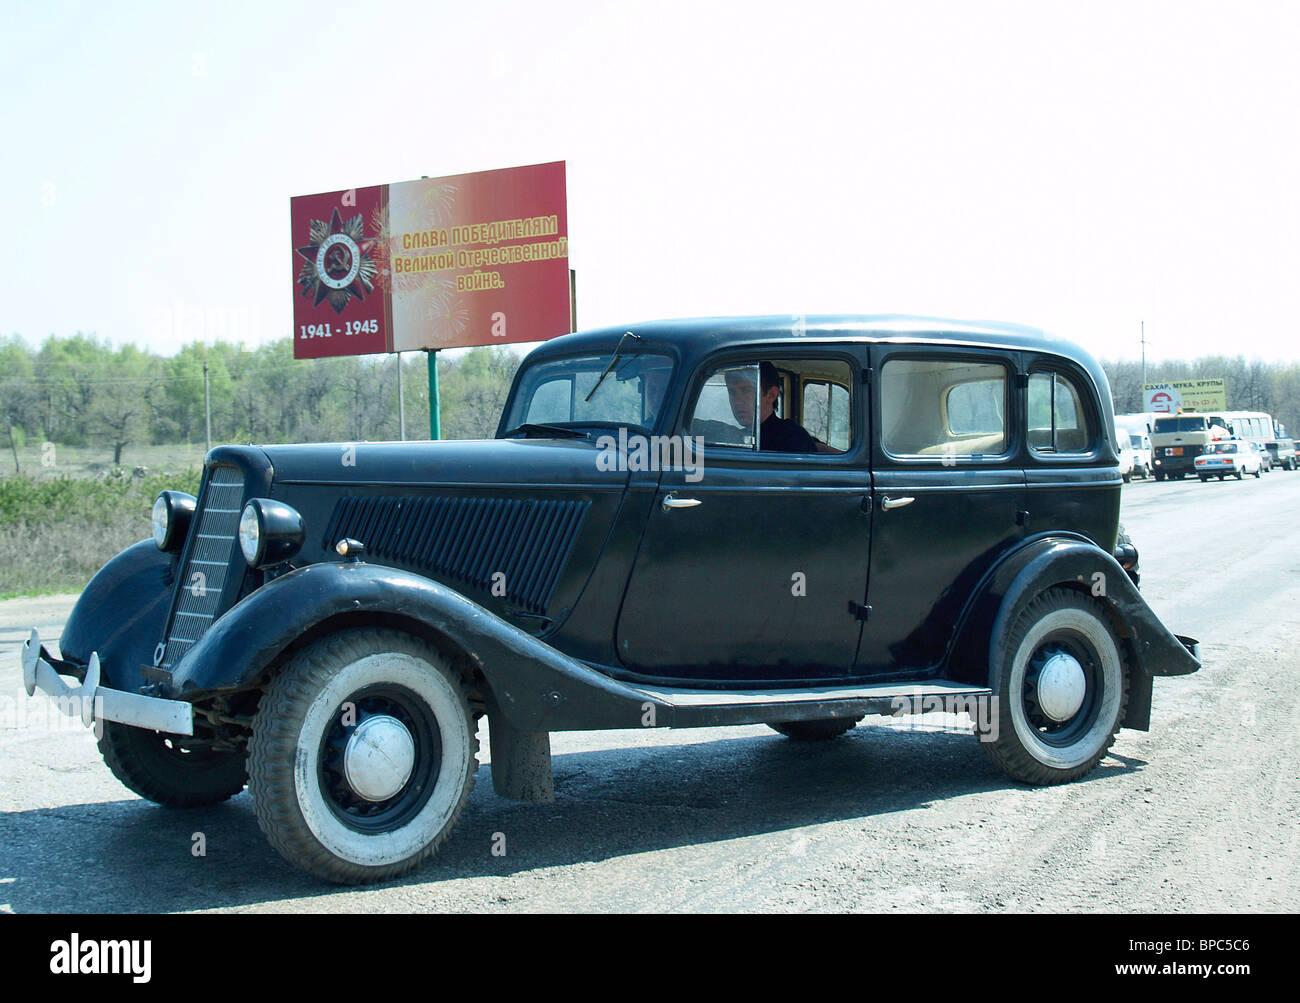 Vintage Automobiles Parade in Saratov Stock Photo: 31000486 - Alamy